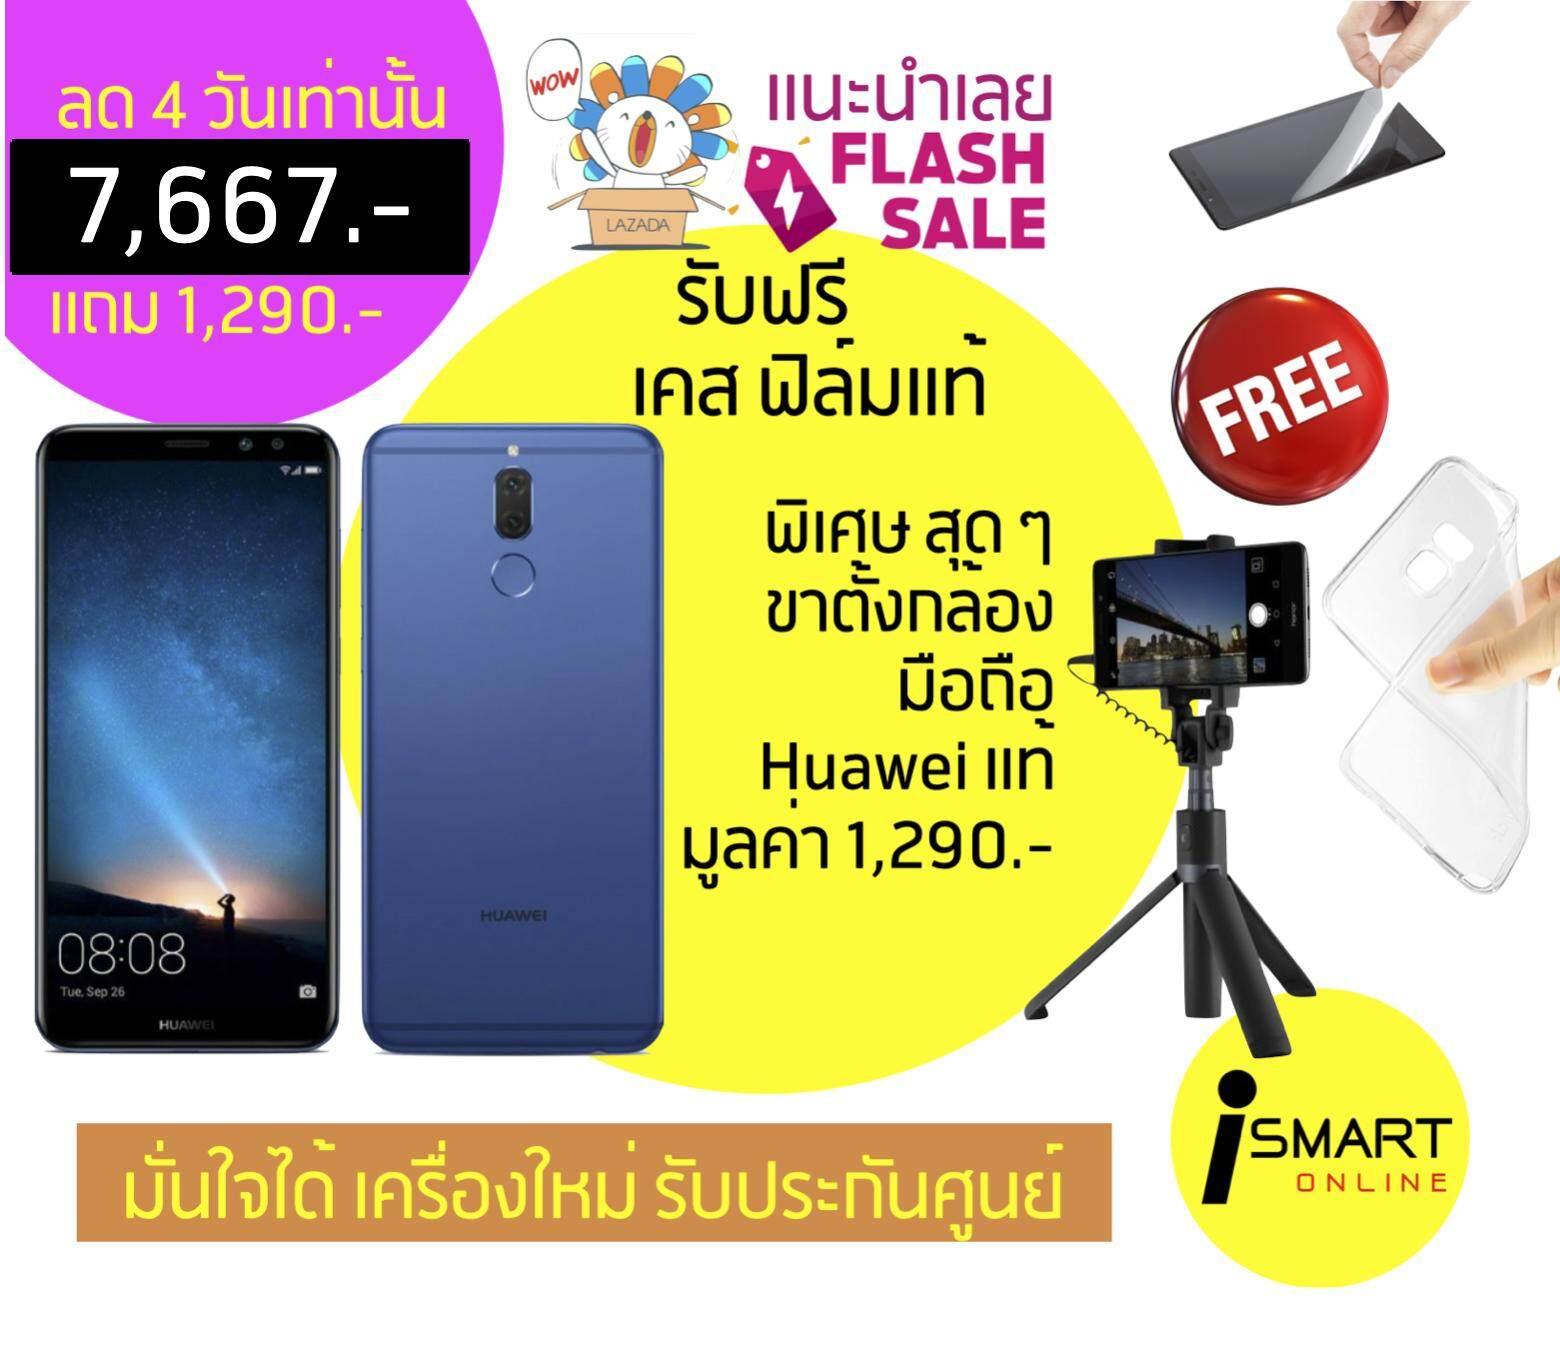 Huawei Nova 2i ลดเหลือ 7,667(สีทอง) แถมอีก 1,290.- กดโค๊ต ismart10 รับฟรี ขาตั้งกล้อง huawei แท้ 1290 บาท +เคสแท้+ฟิล์มกันรอยแท้